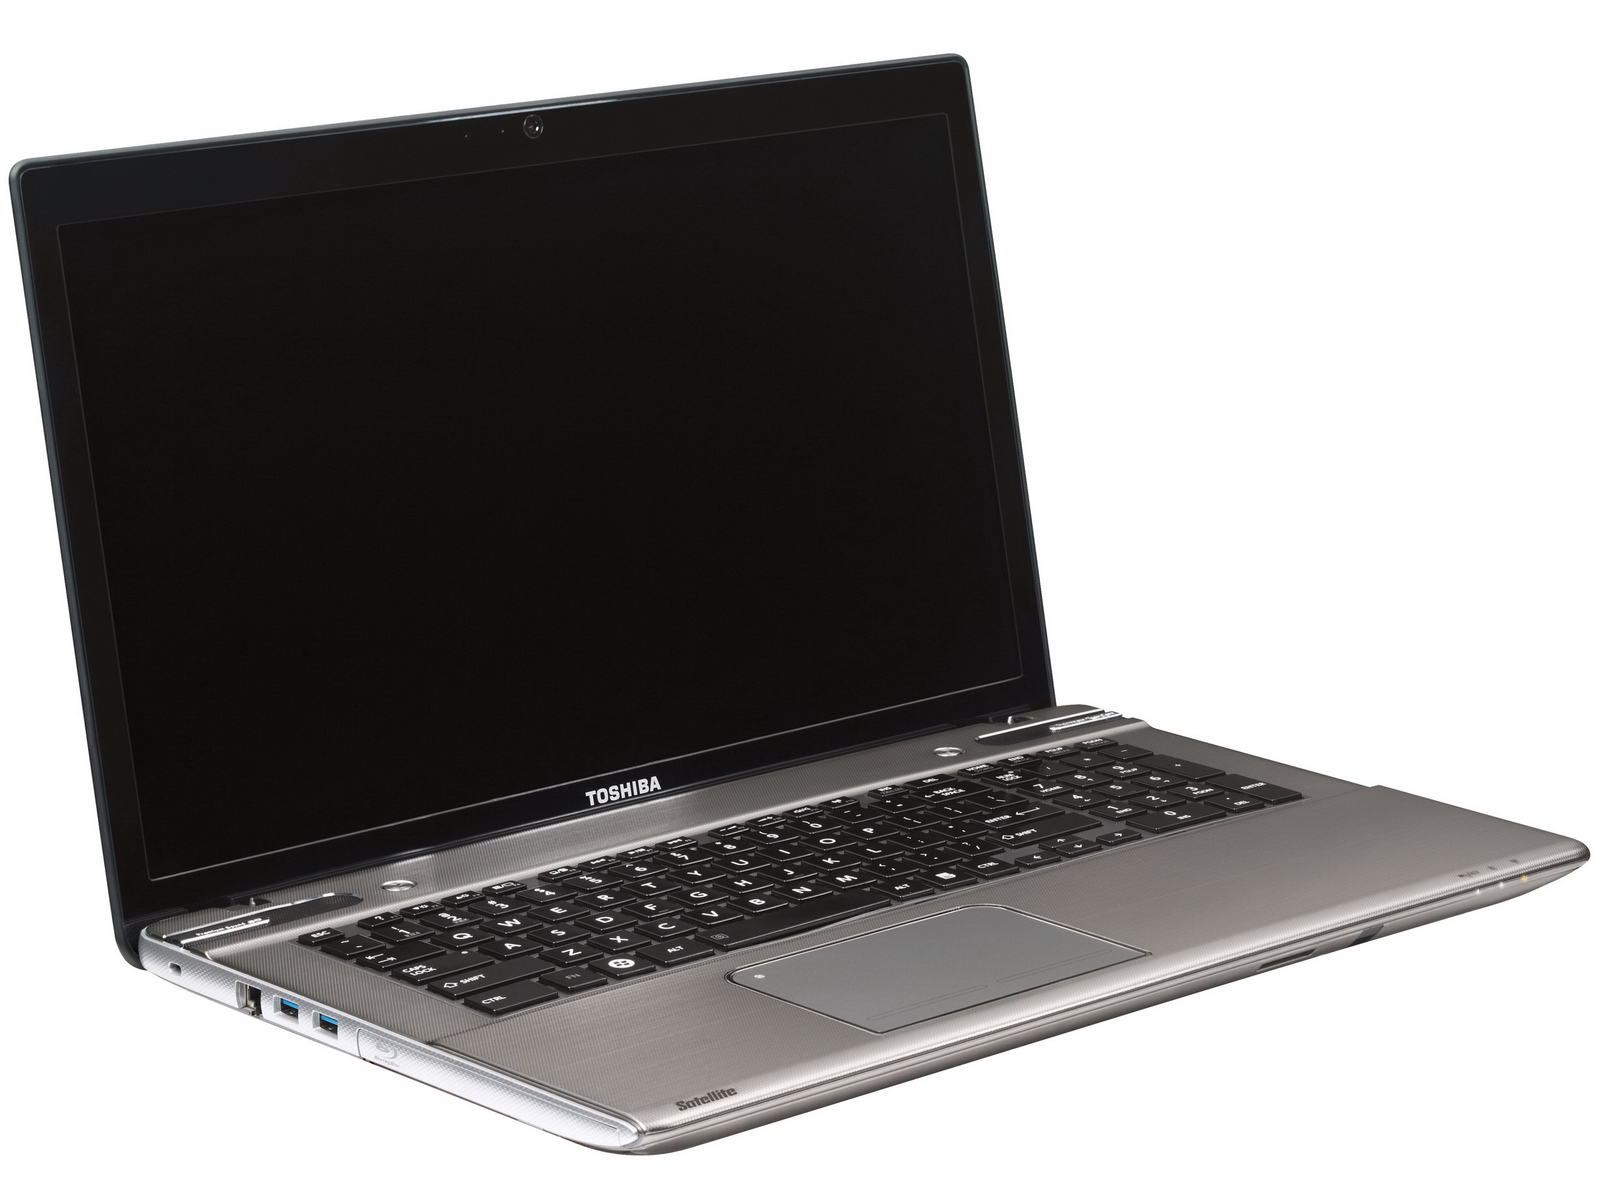 "TOSHIBA Satellite P870 P875 17.3/"" Laptop Front LCD BEZEL w// Webcam Port"